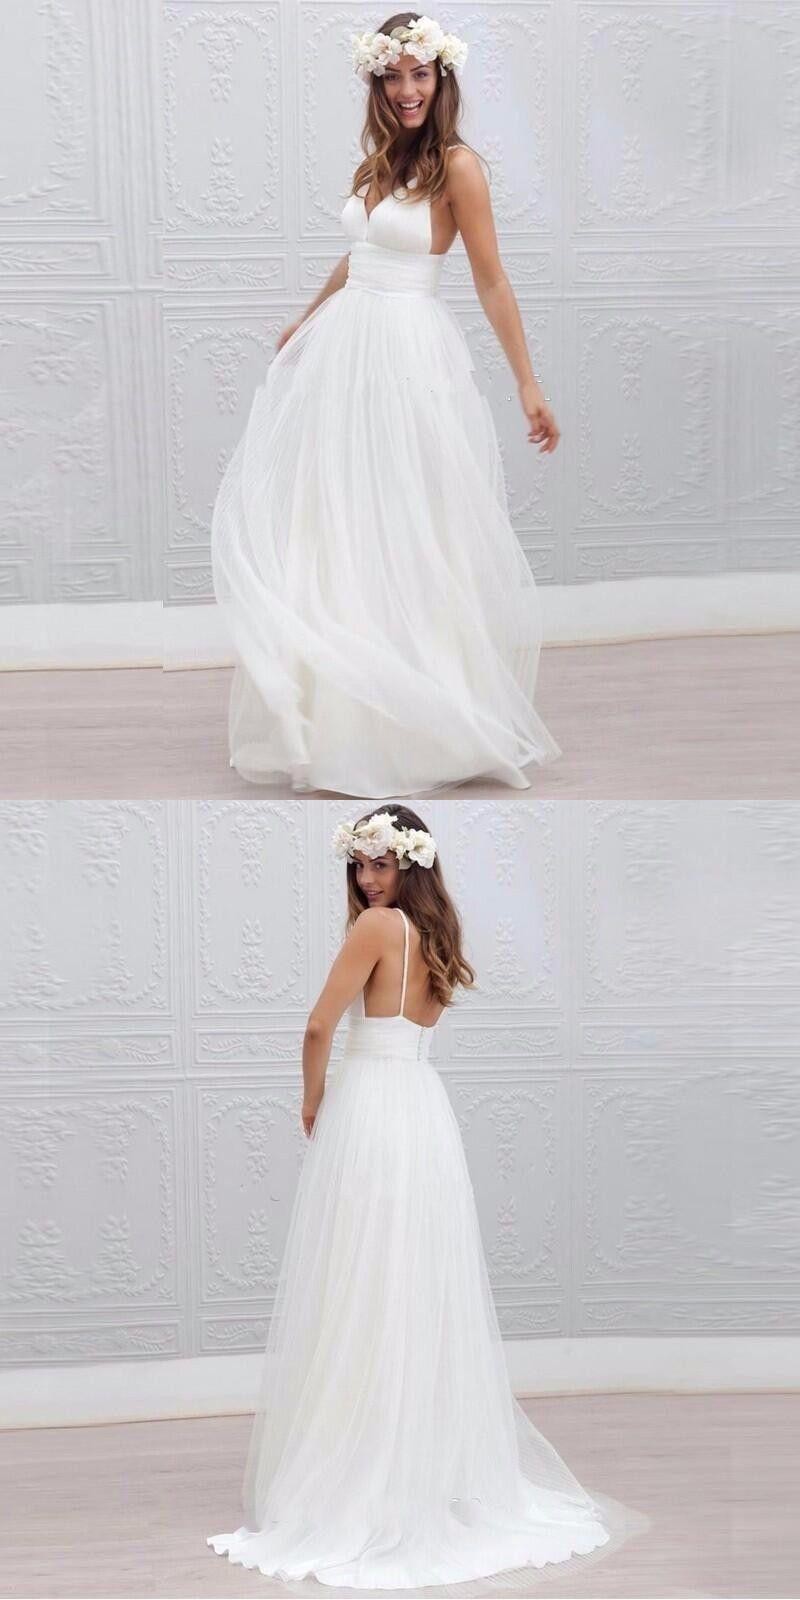 Size 8 wedding dress  Backless Summer Beach Wedding Dress with Spaghetti Straps Custom